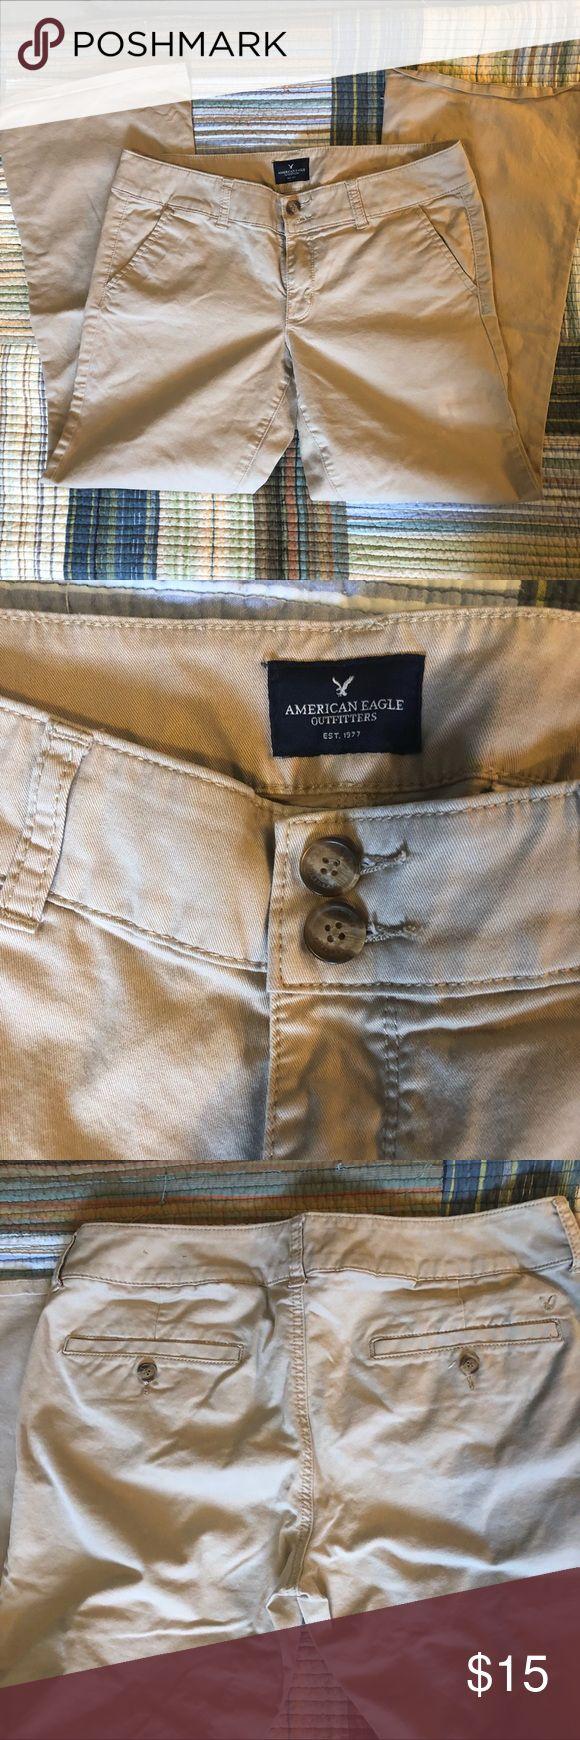 American Eagle Khaki pants Great shape! No frays...size 10, artist cut, stretch khakis. Very comfortable! American Eagle Outfitters Pants